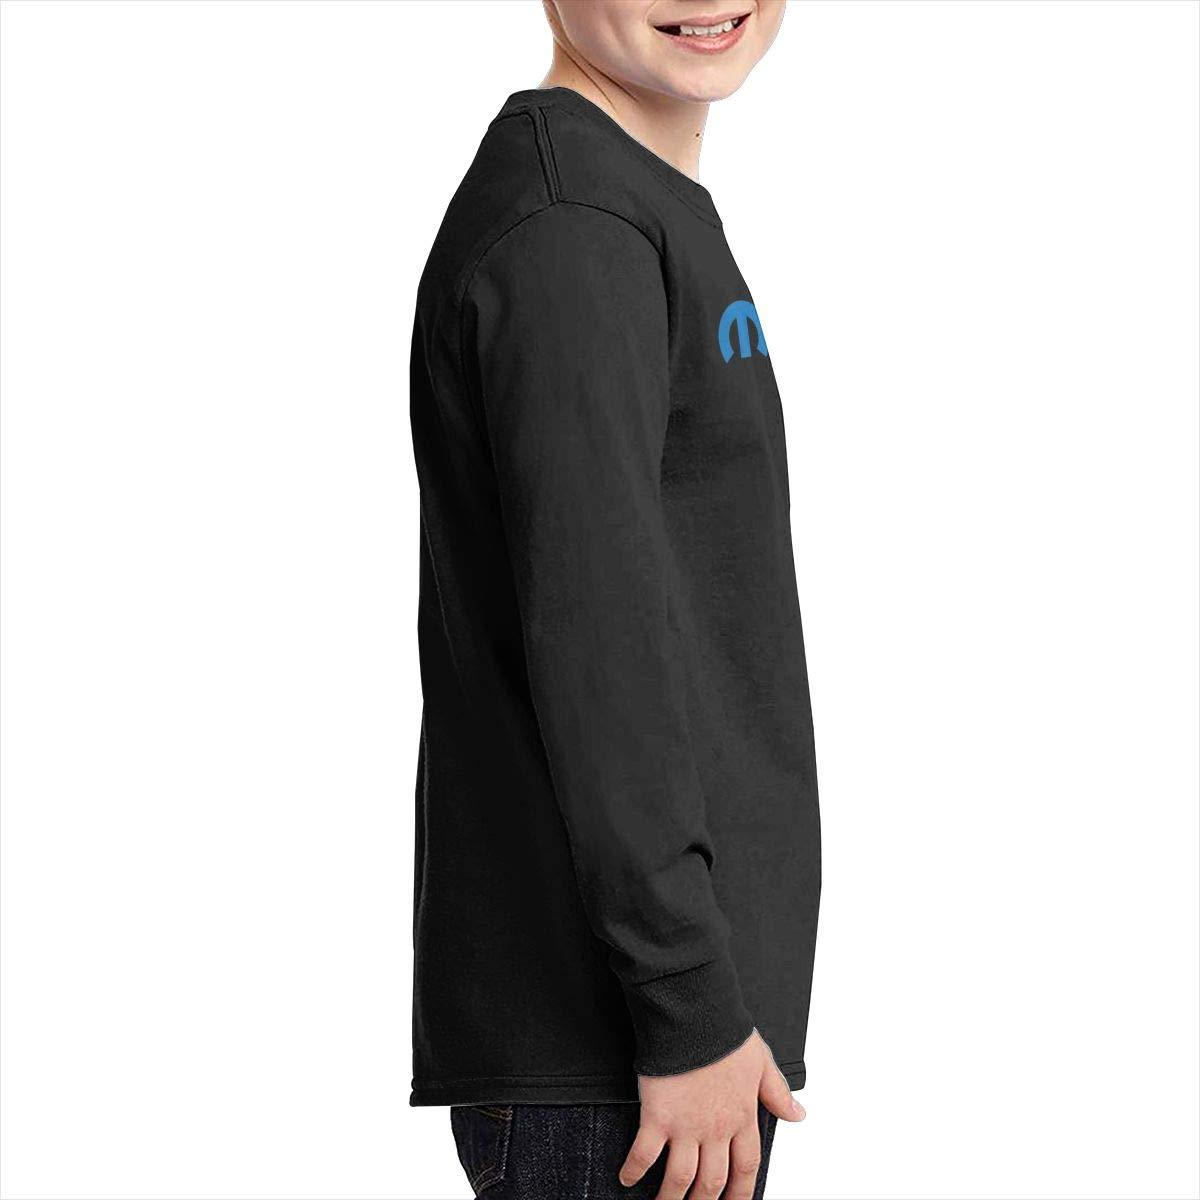 Optumus Mopar Kids Sweatshirts Long Sleeve T Shirt Boy Girl Children Teenagers Unisex Tee